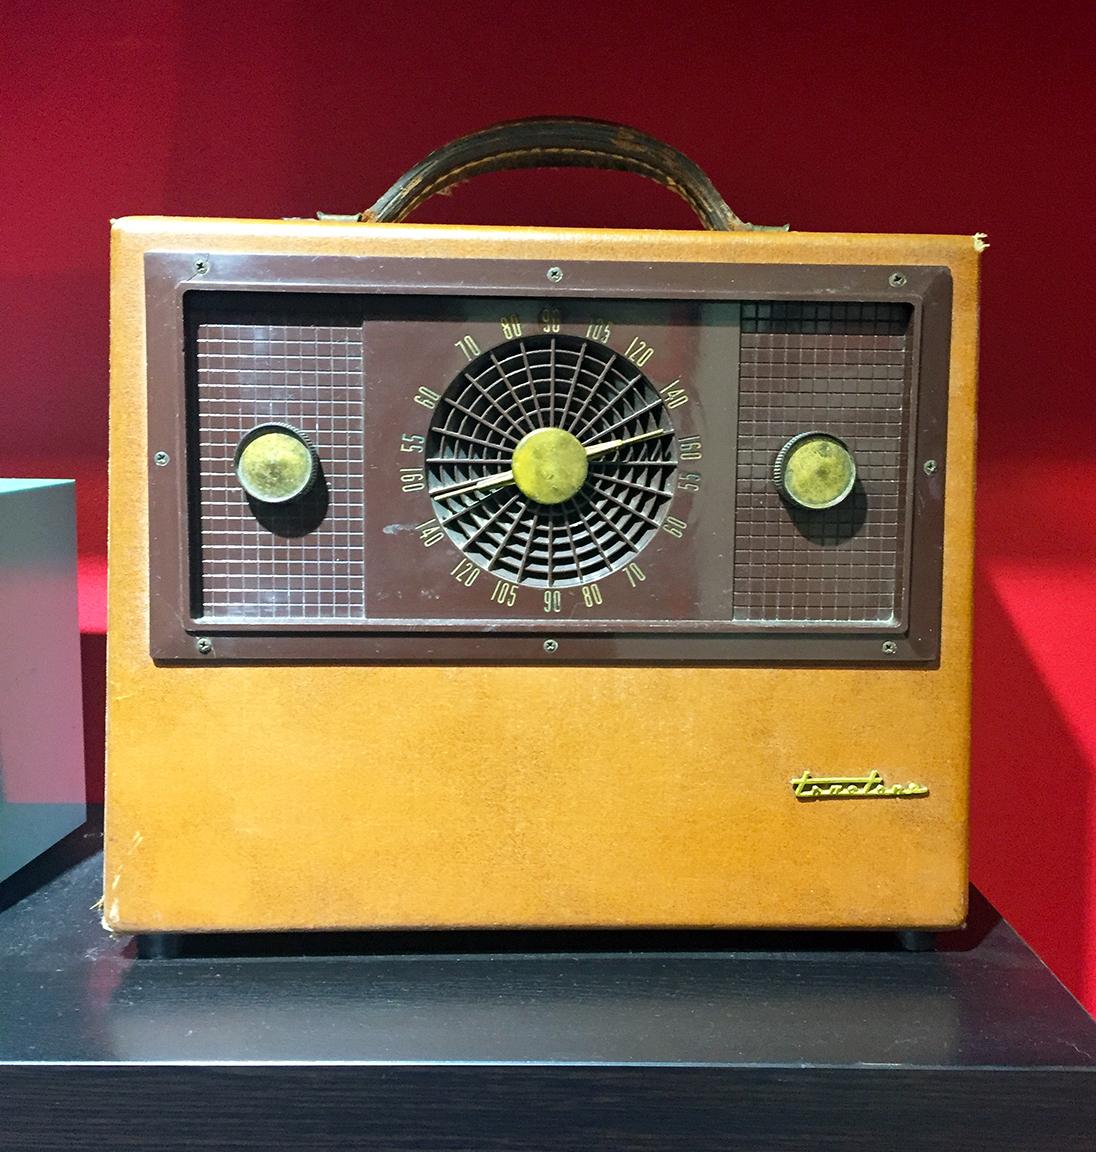 Mid-1950's Trutone Portable Radio